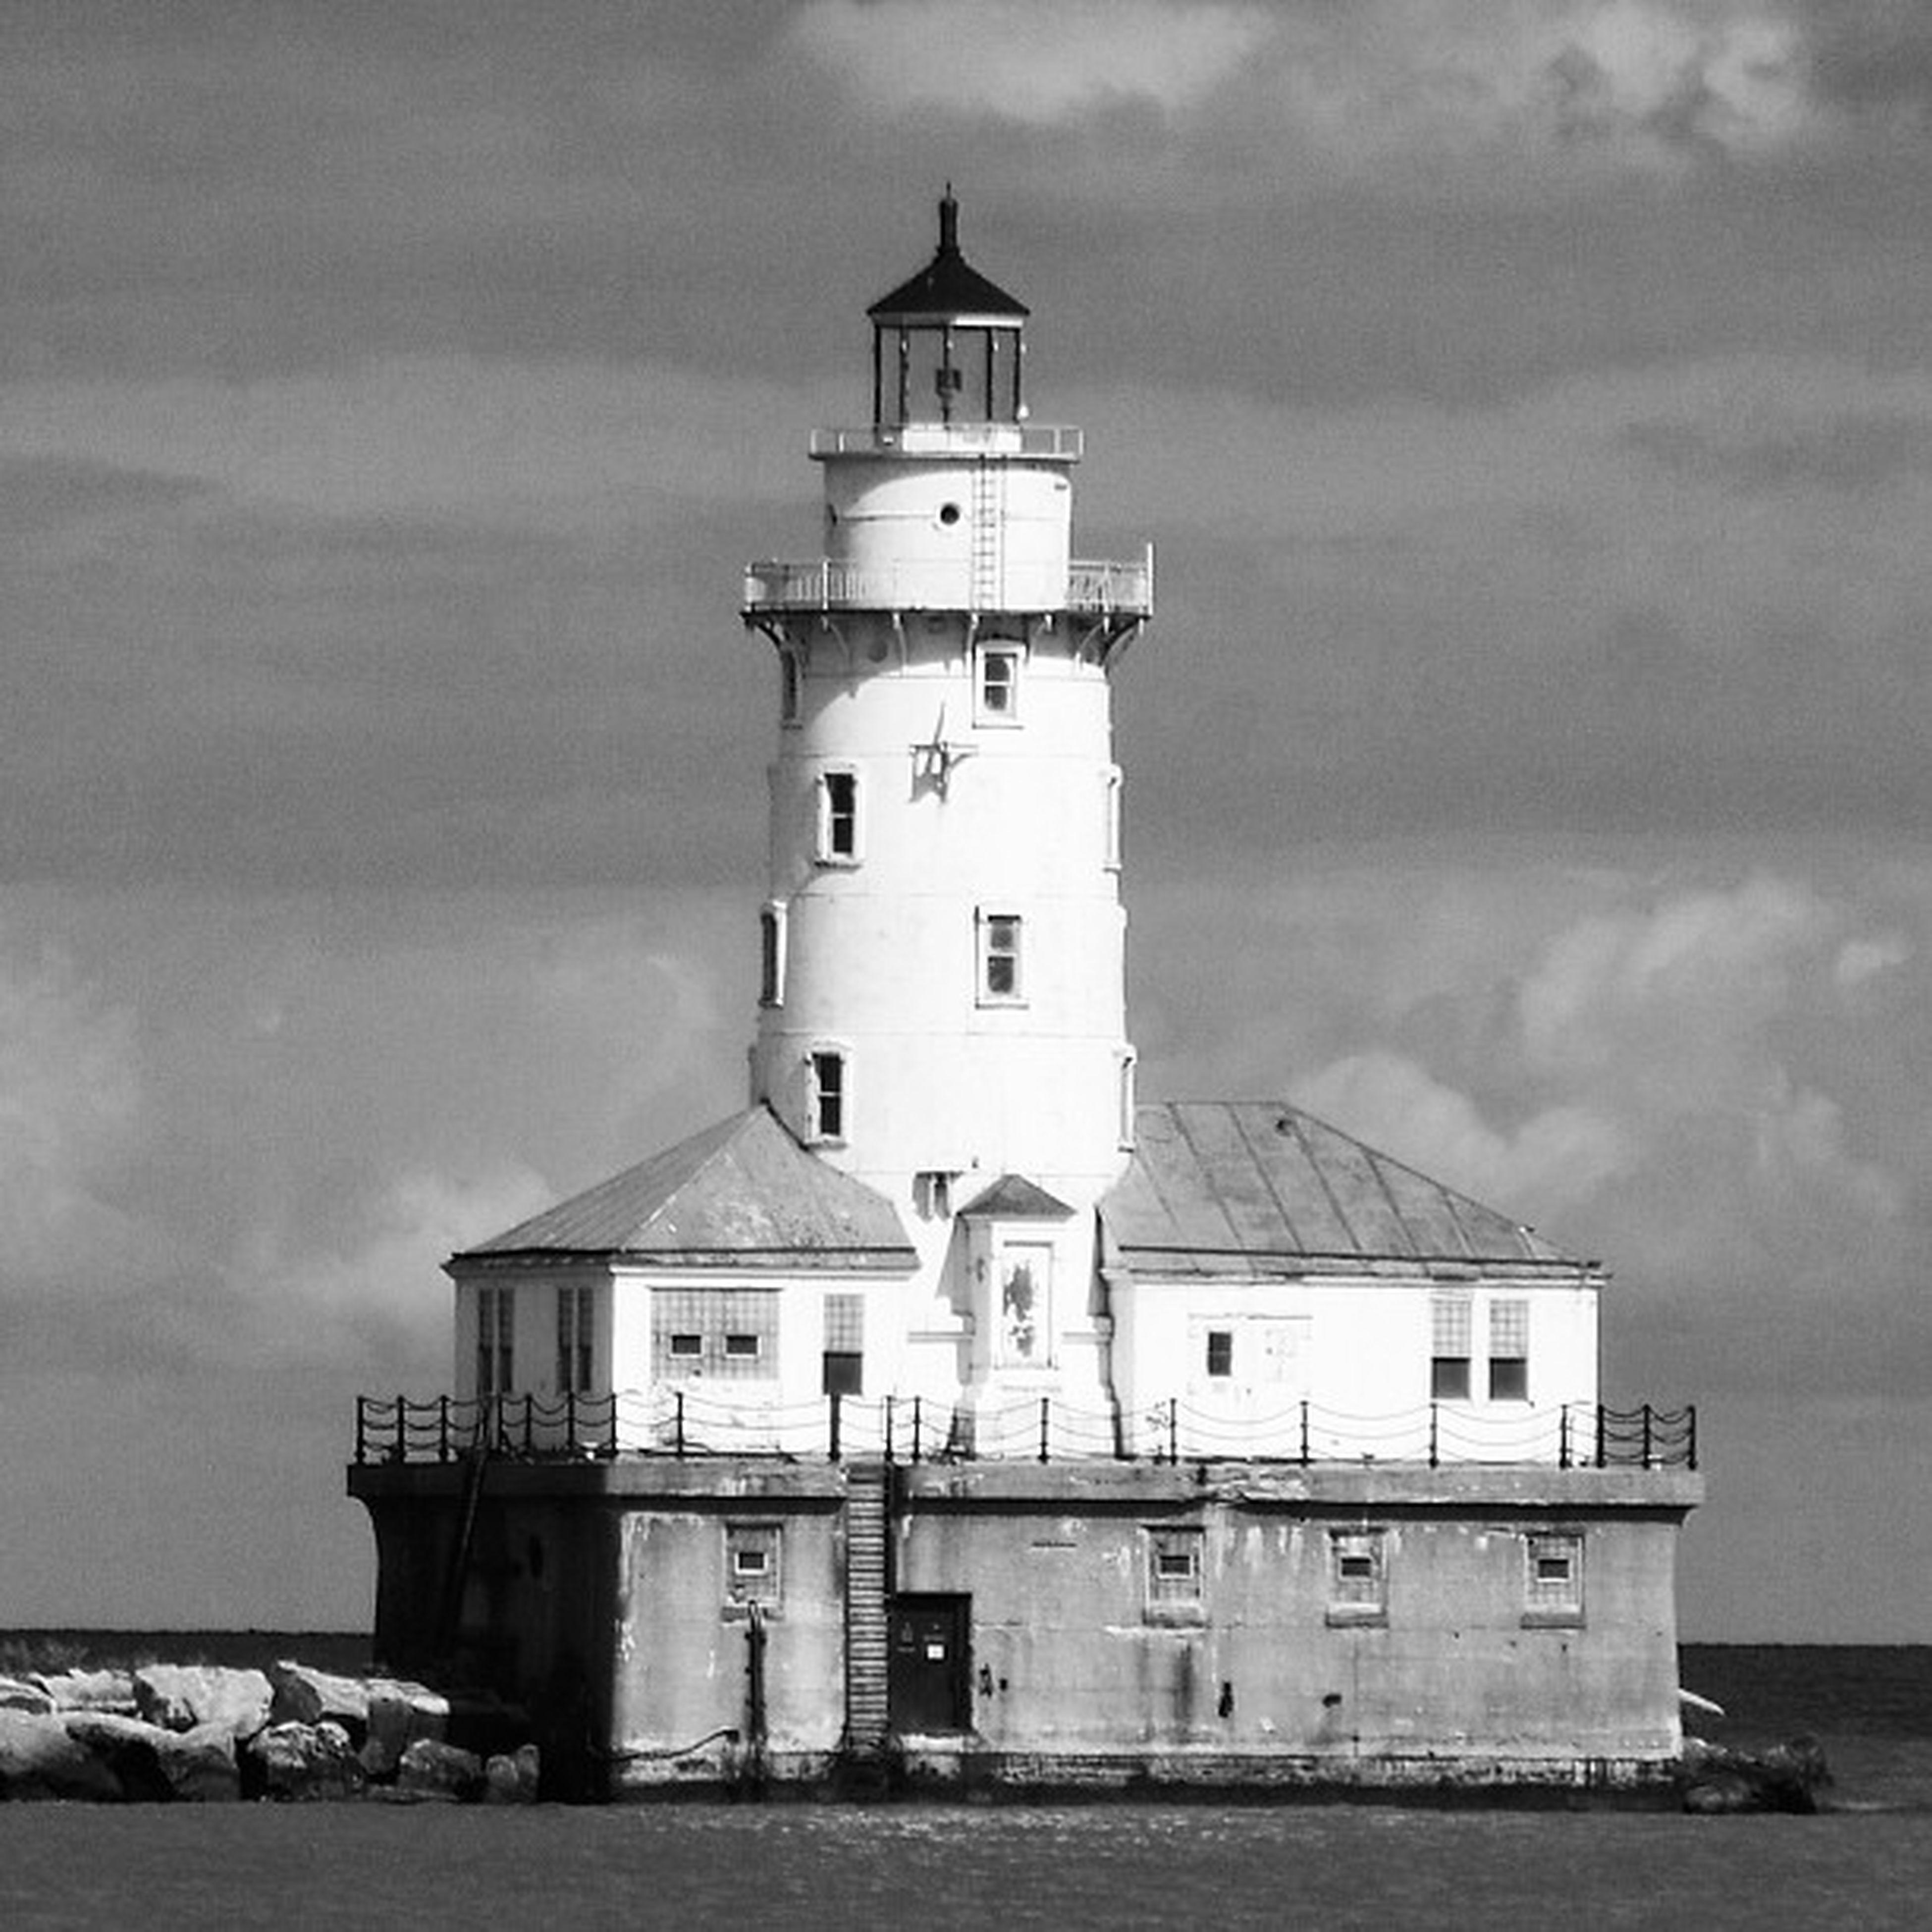 Piers Edge Water Old Chicago Light Blackandwhite Glass Lighthouse Concrete Pier Illinois Navypier Pictapgoapp Piersedge